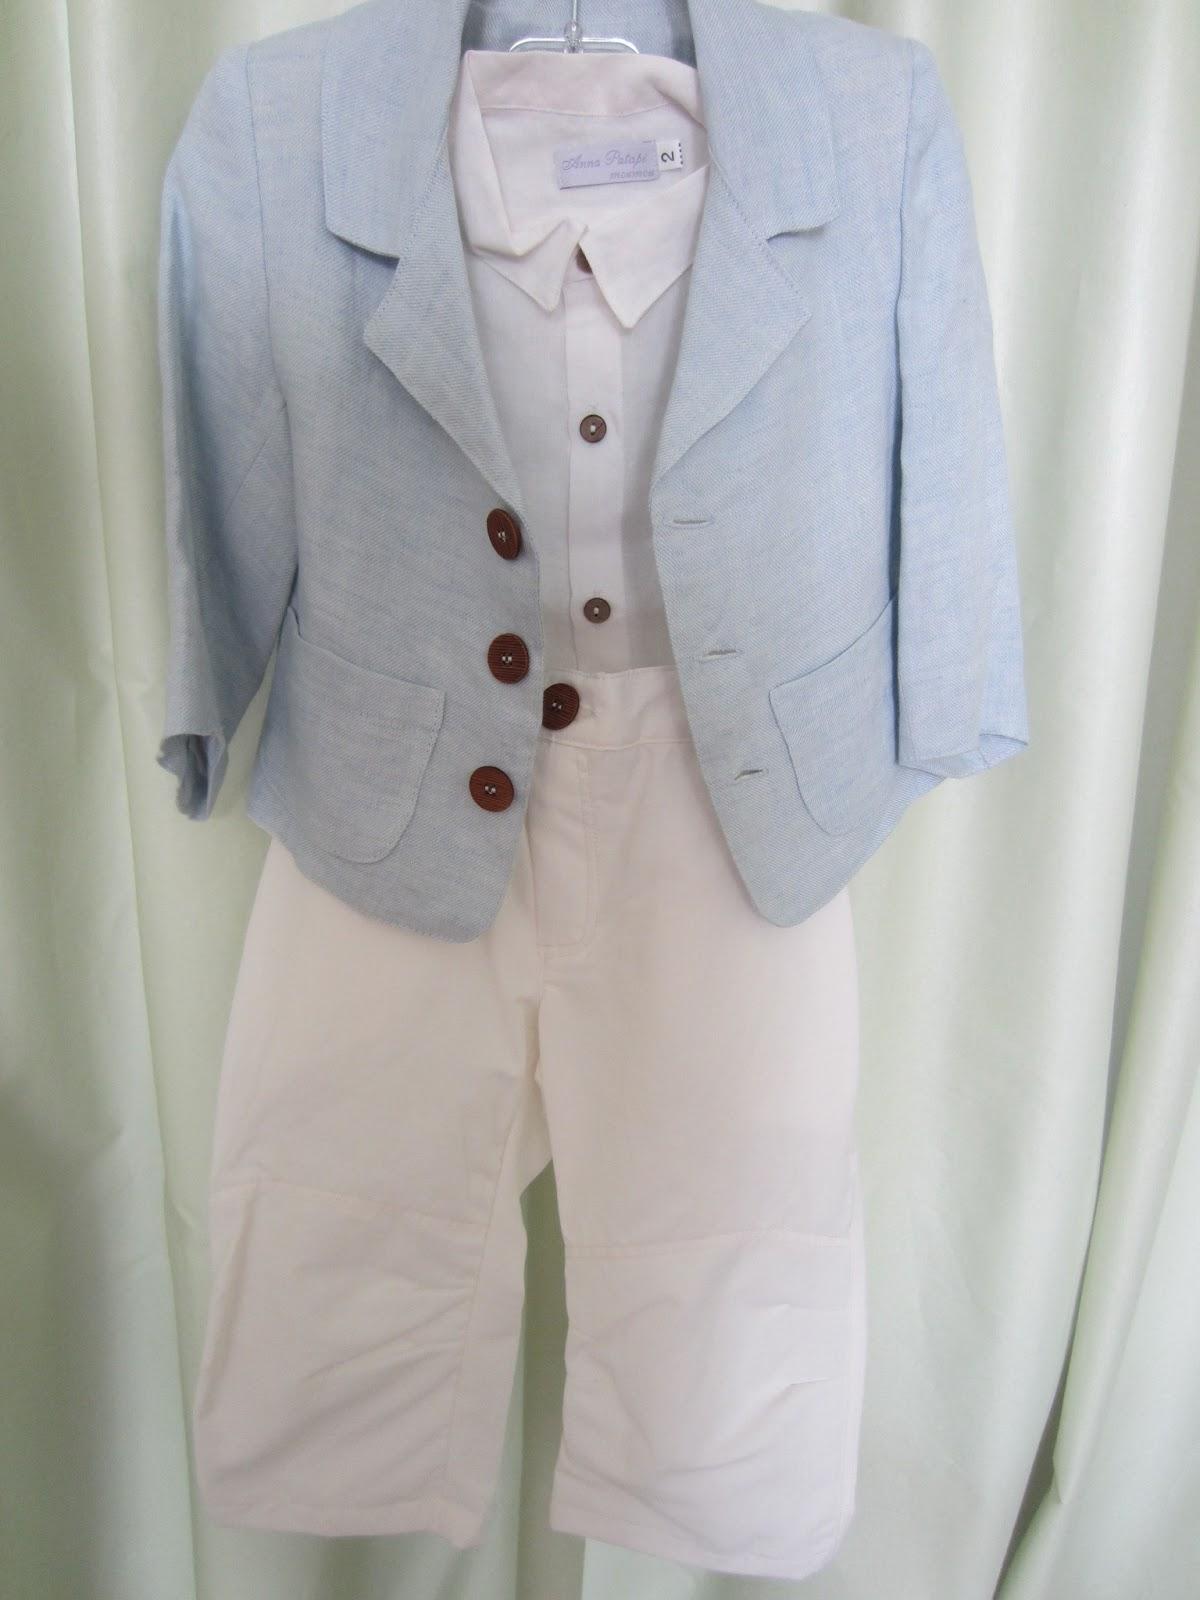 d07b2235163 Παντελόνι, πουκάμισο, σακάκι και καπέλο. Νο 2. Τιμή: 60 ευρώ.